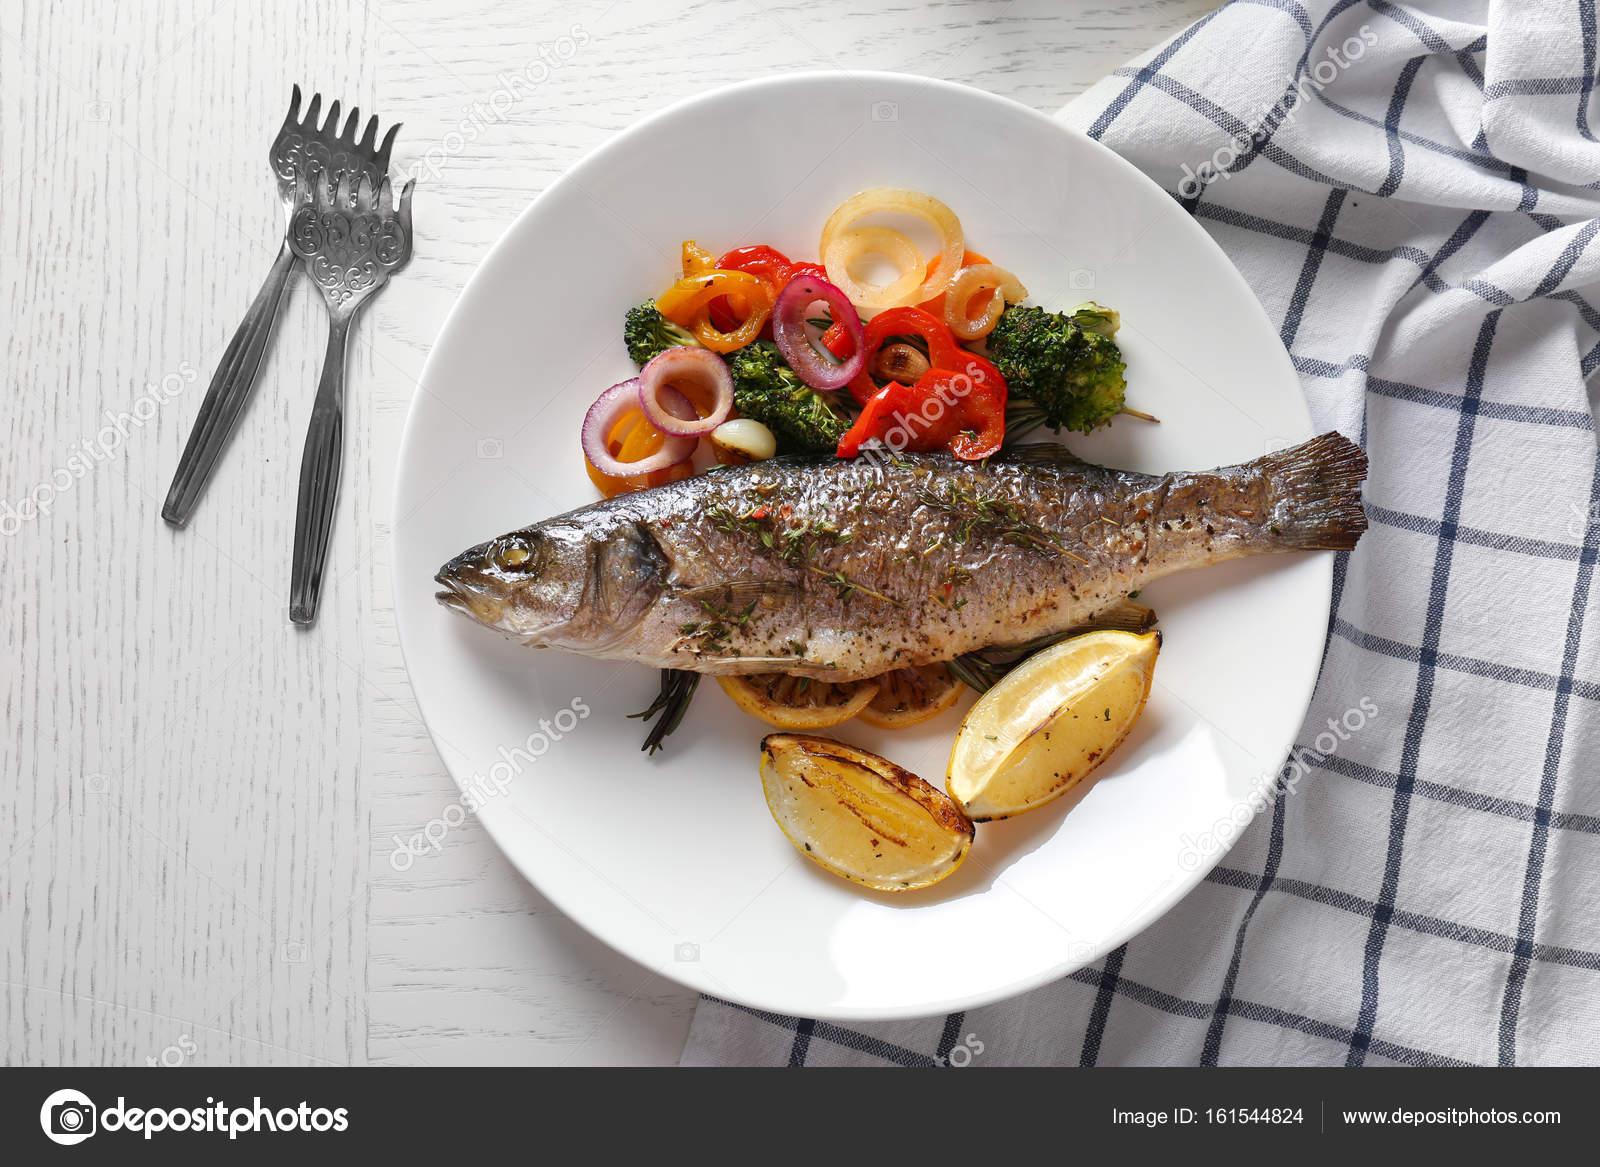 Kızarmış balık fırında pişmiş